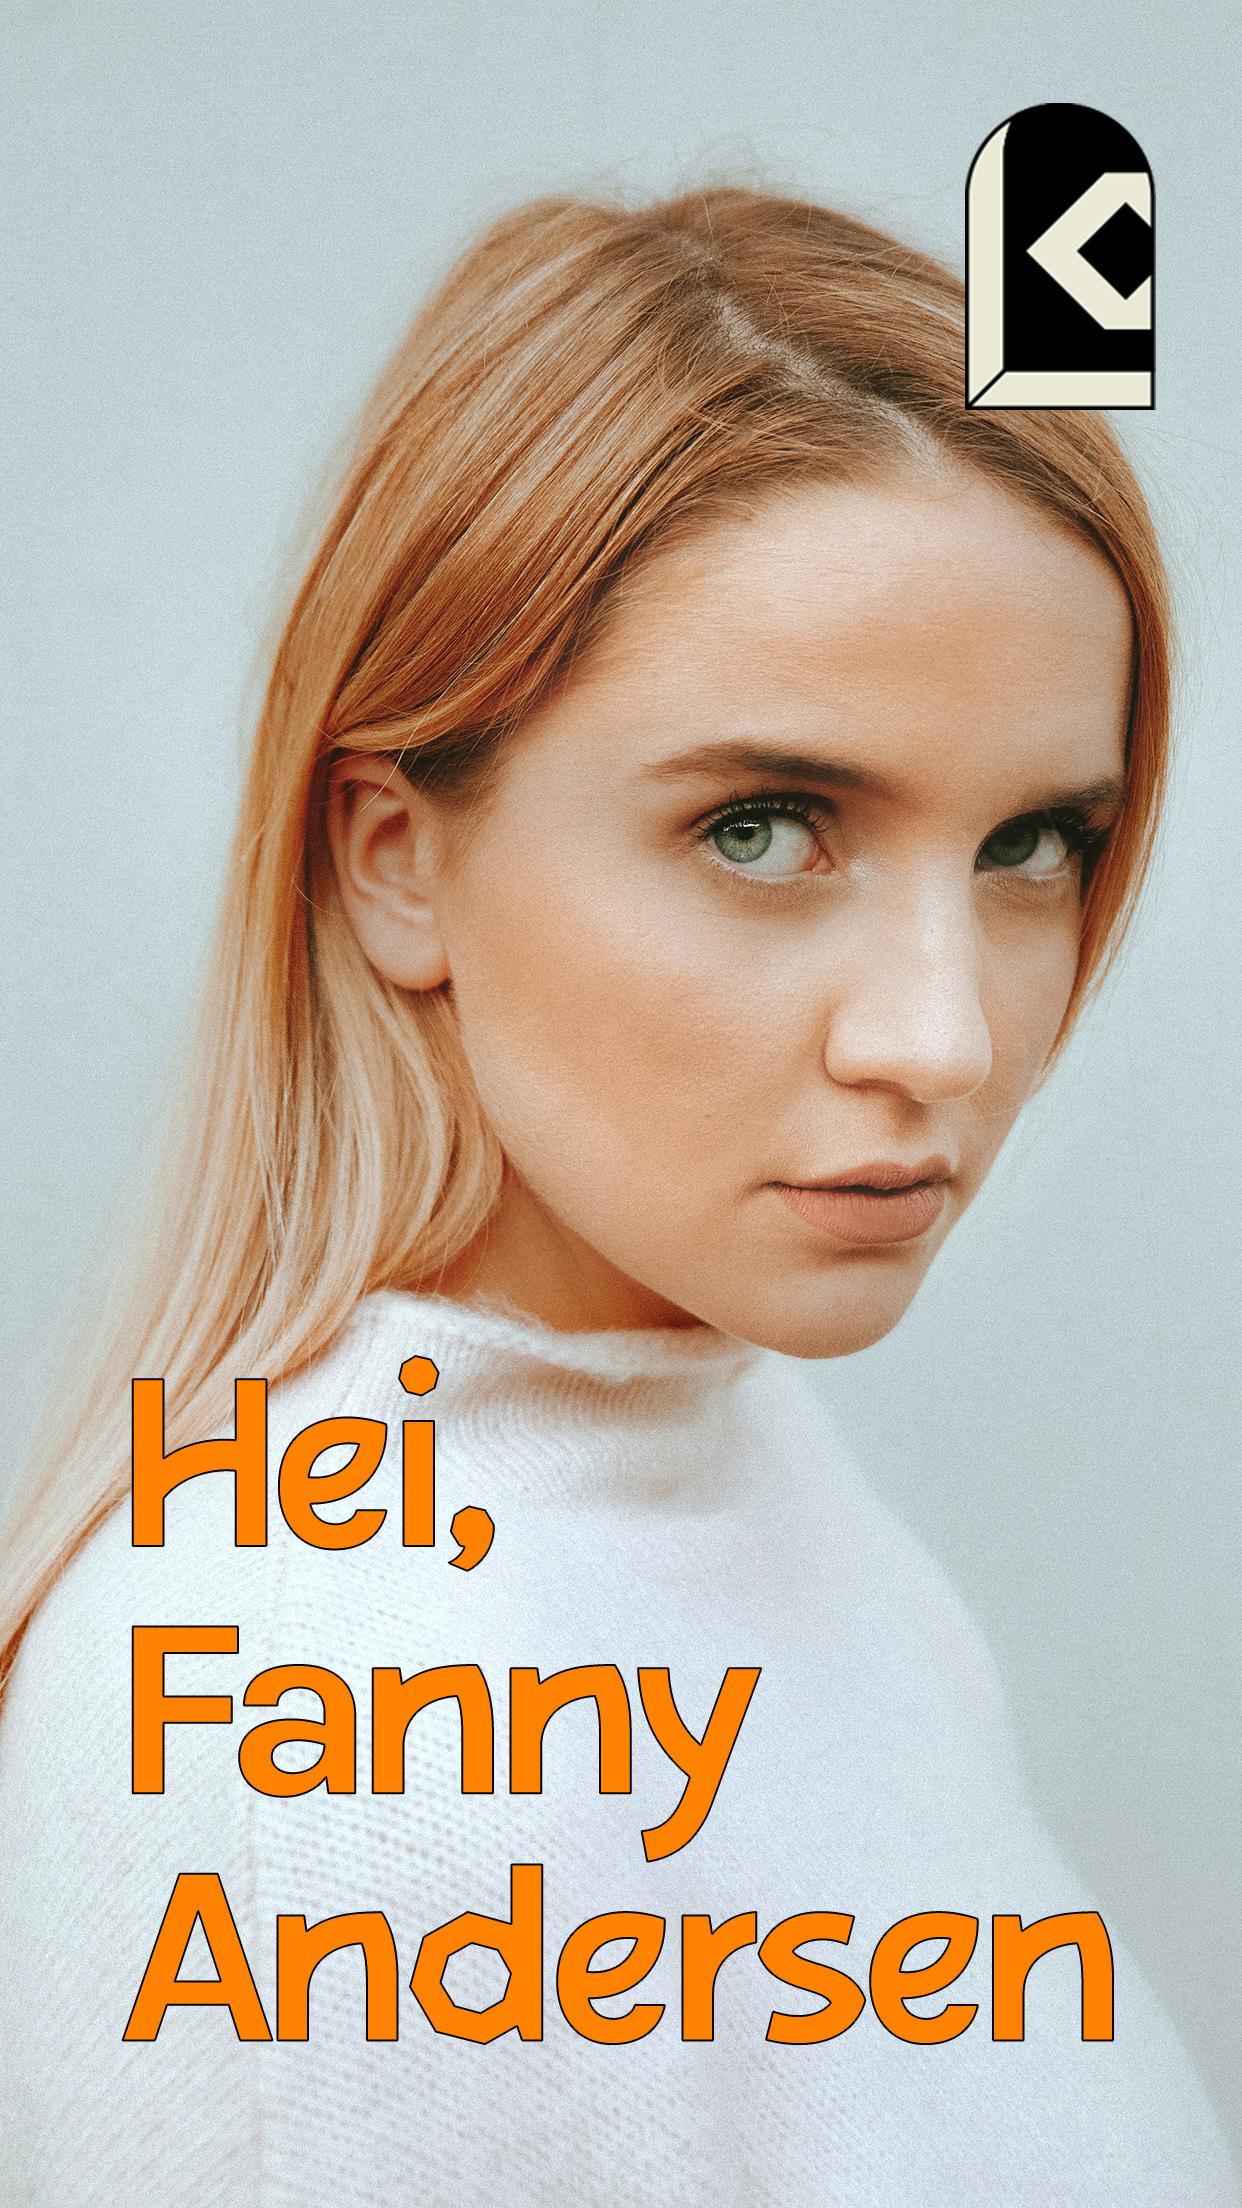 FannyAndersen_Snapchat